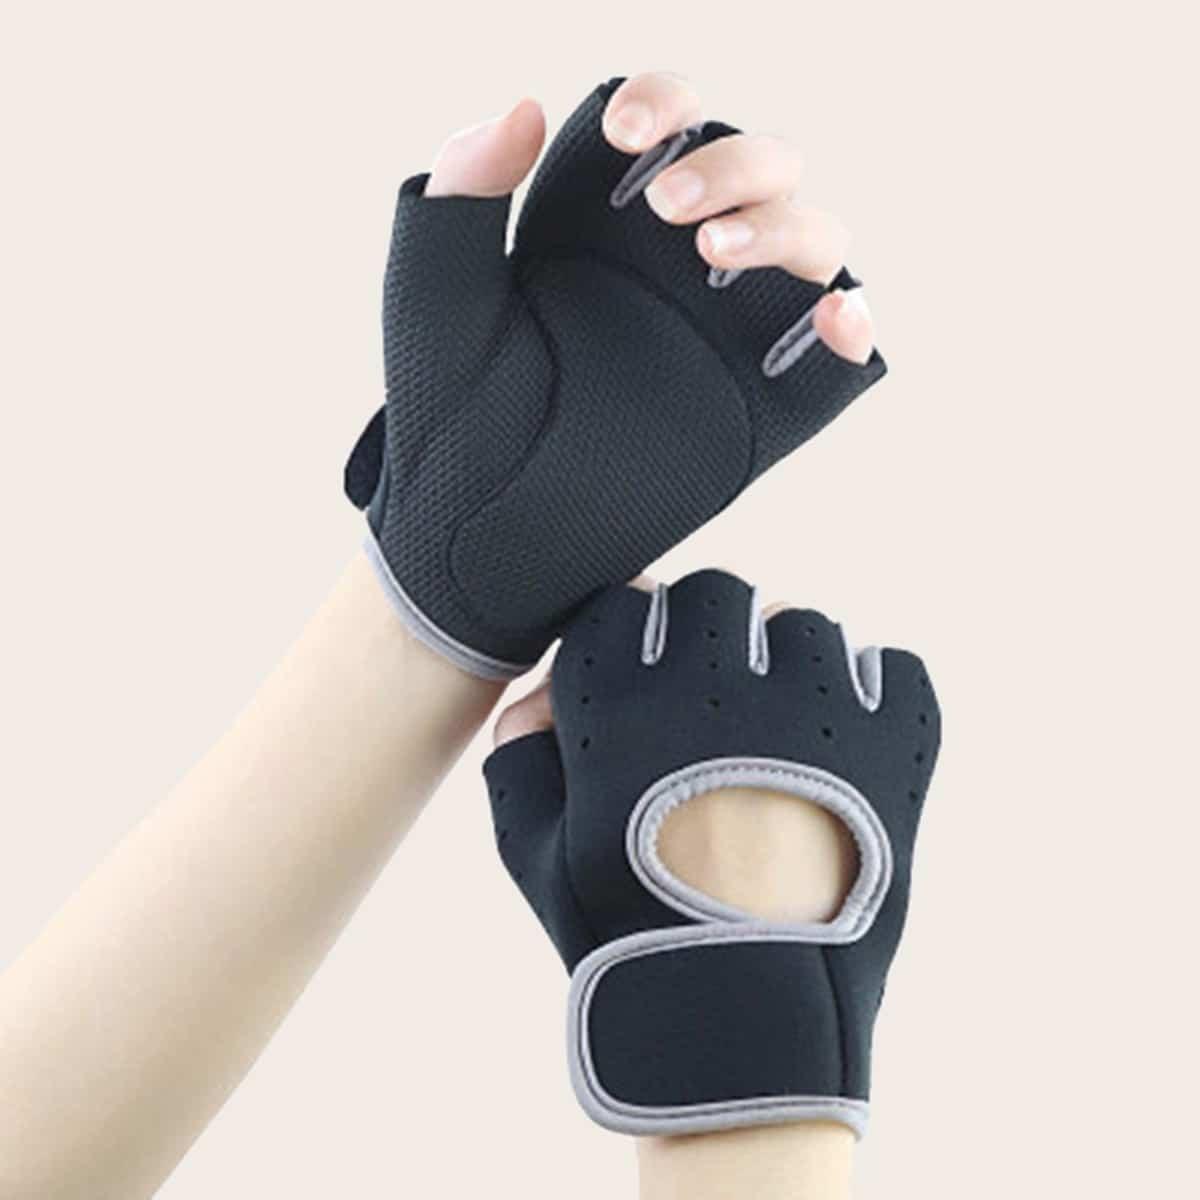 SHEIN coupon: Cut Out Decor Fingerless Gloves 1pair